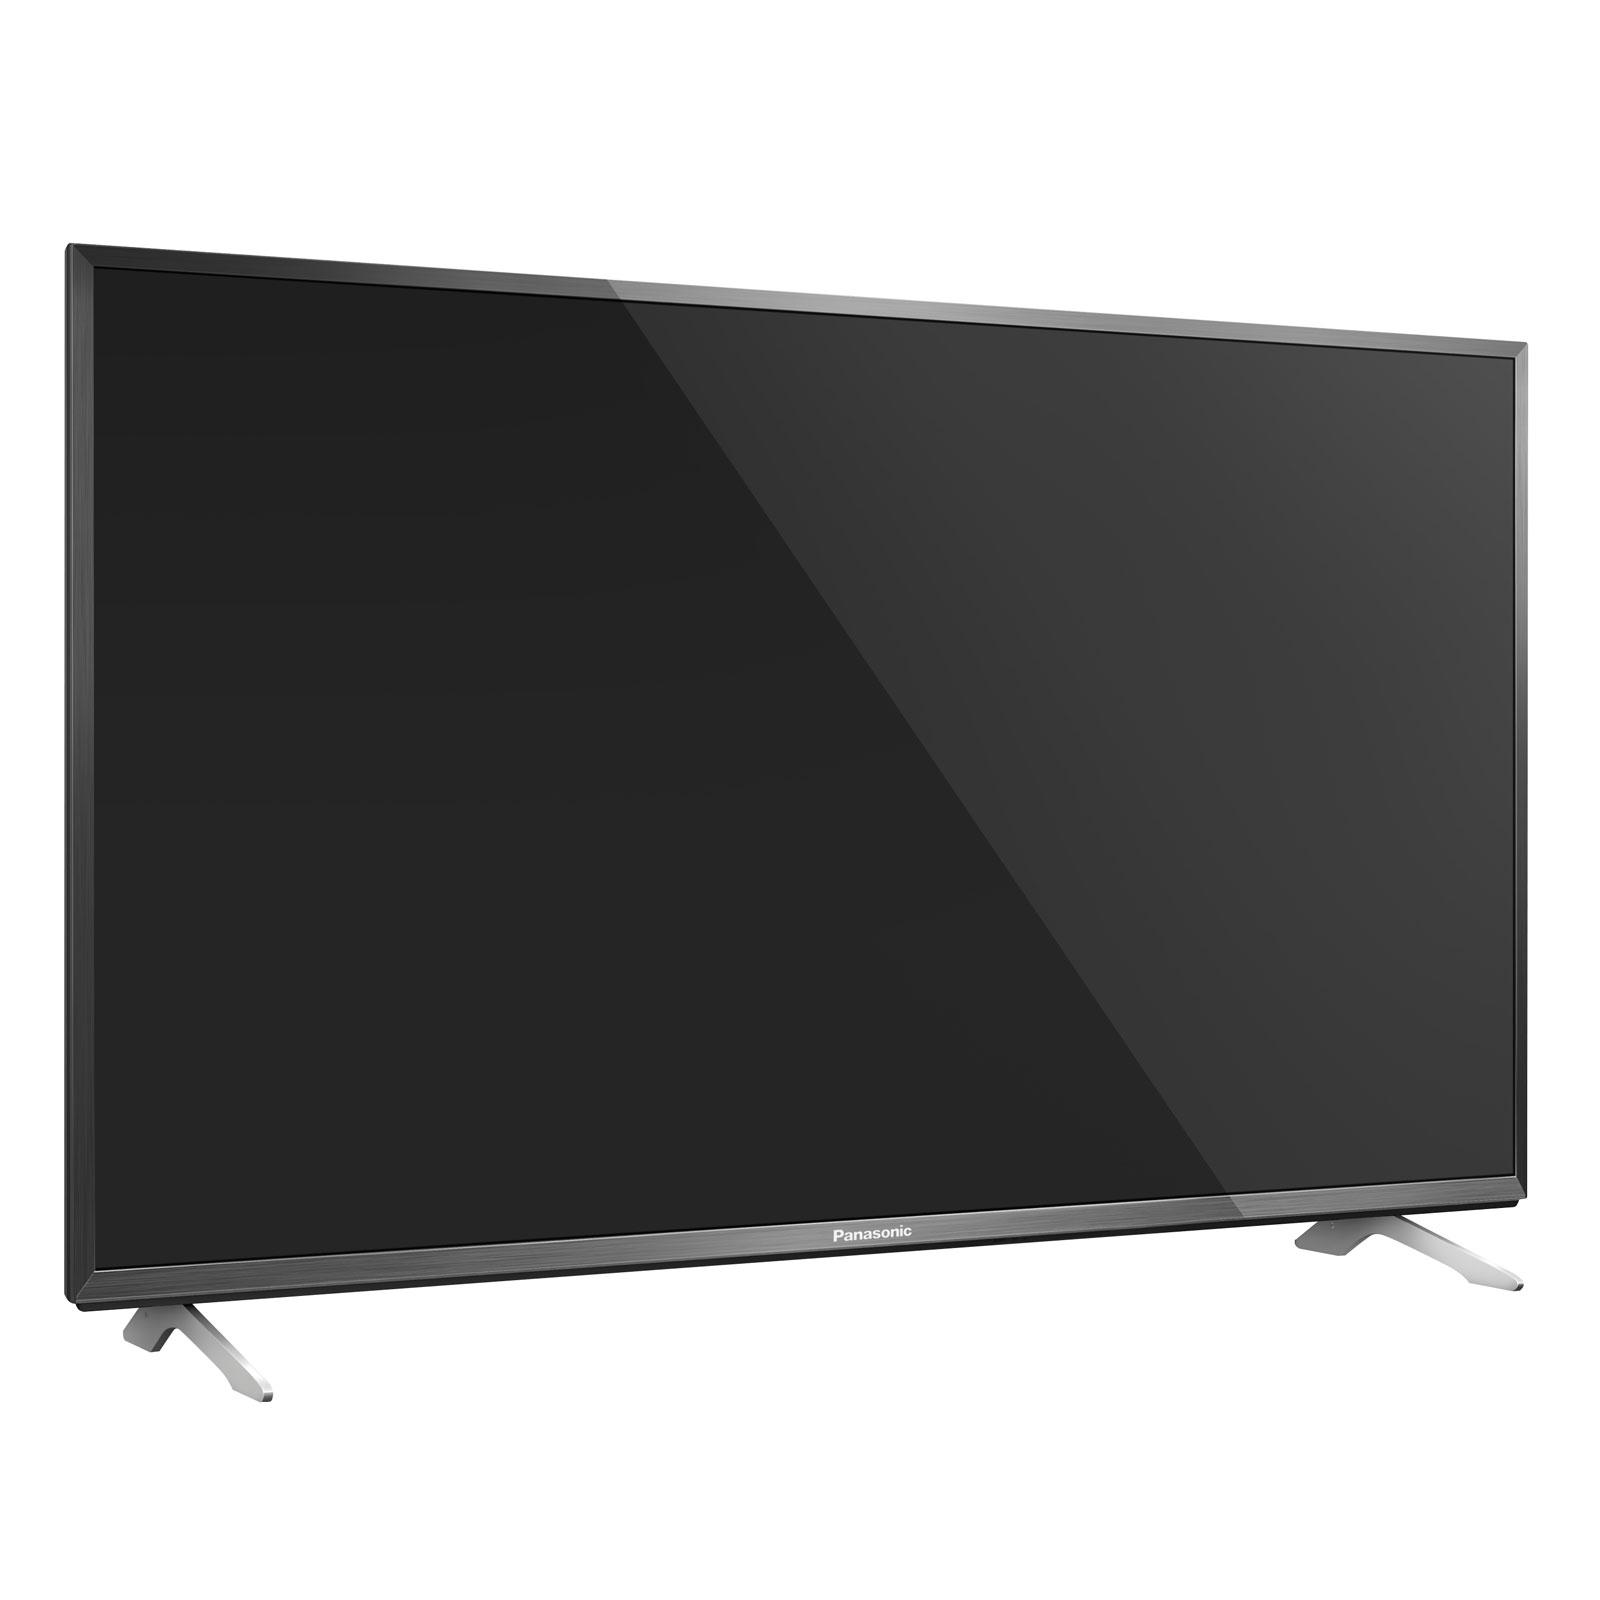 panasonic tx 40cx700e tv panasonic sur. Black Bedroom Furniture Sets. Home Design Ideas